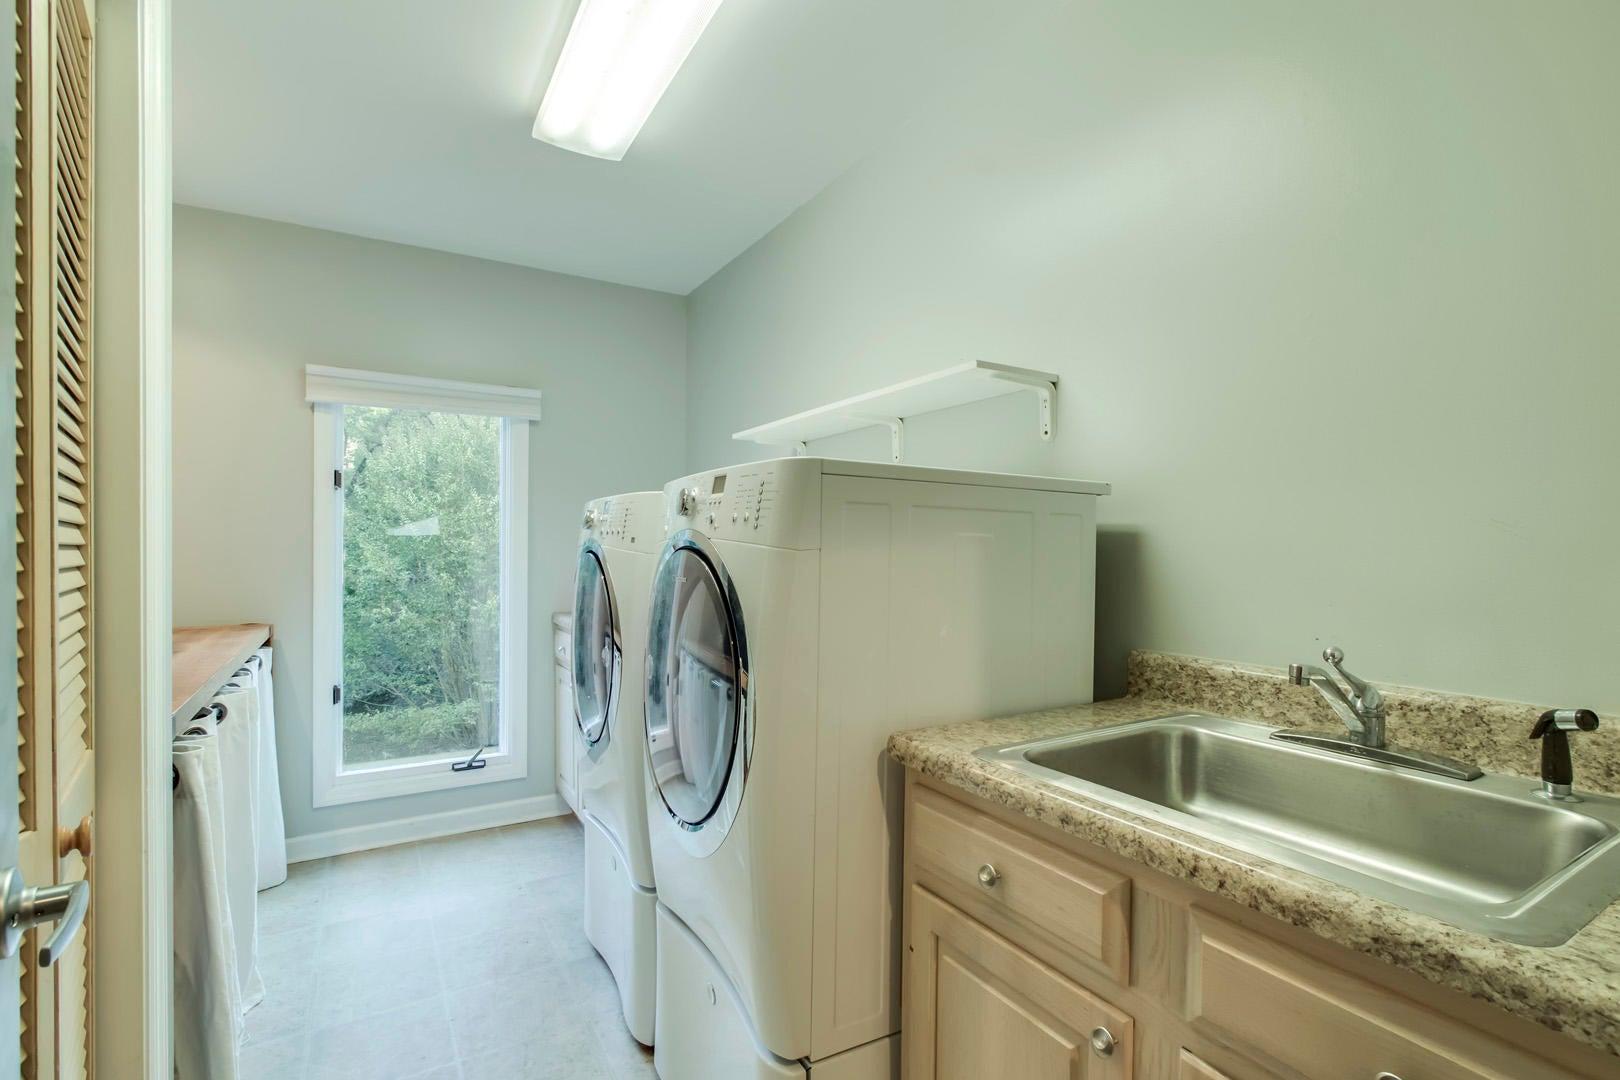 15_OakhurstDriveSW_431_Laundry